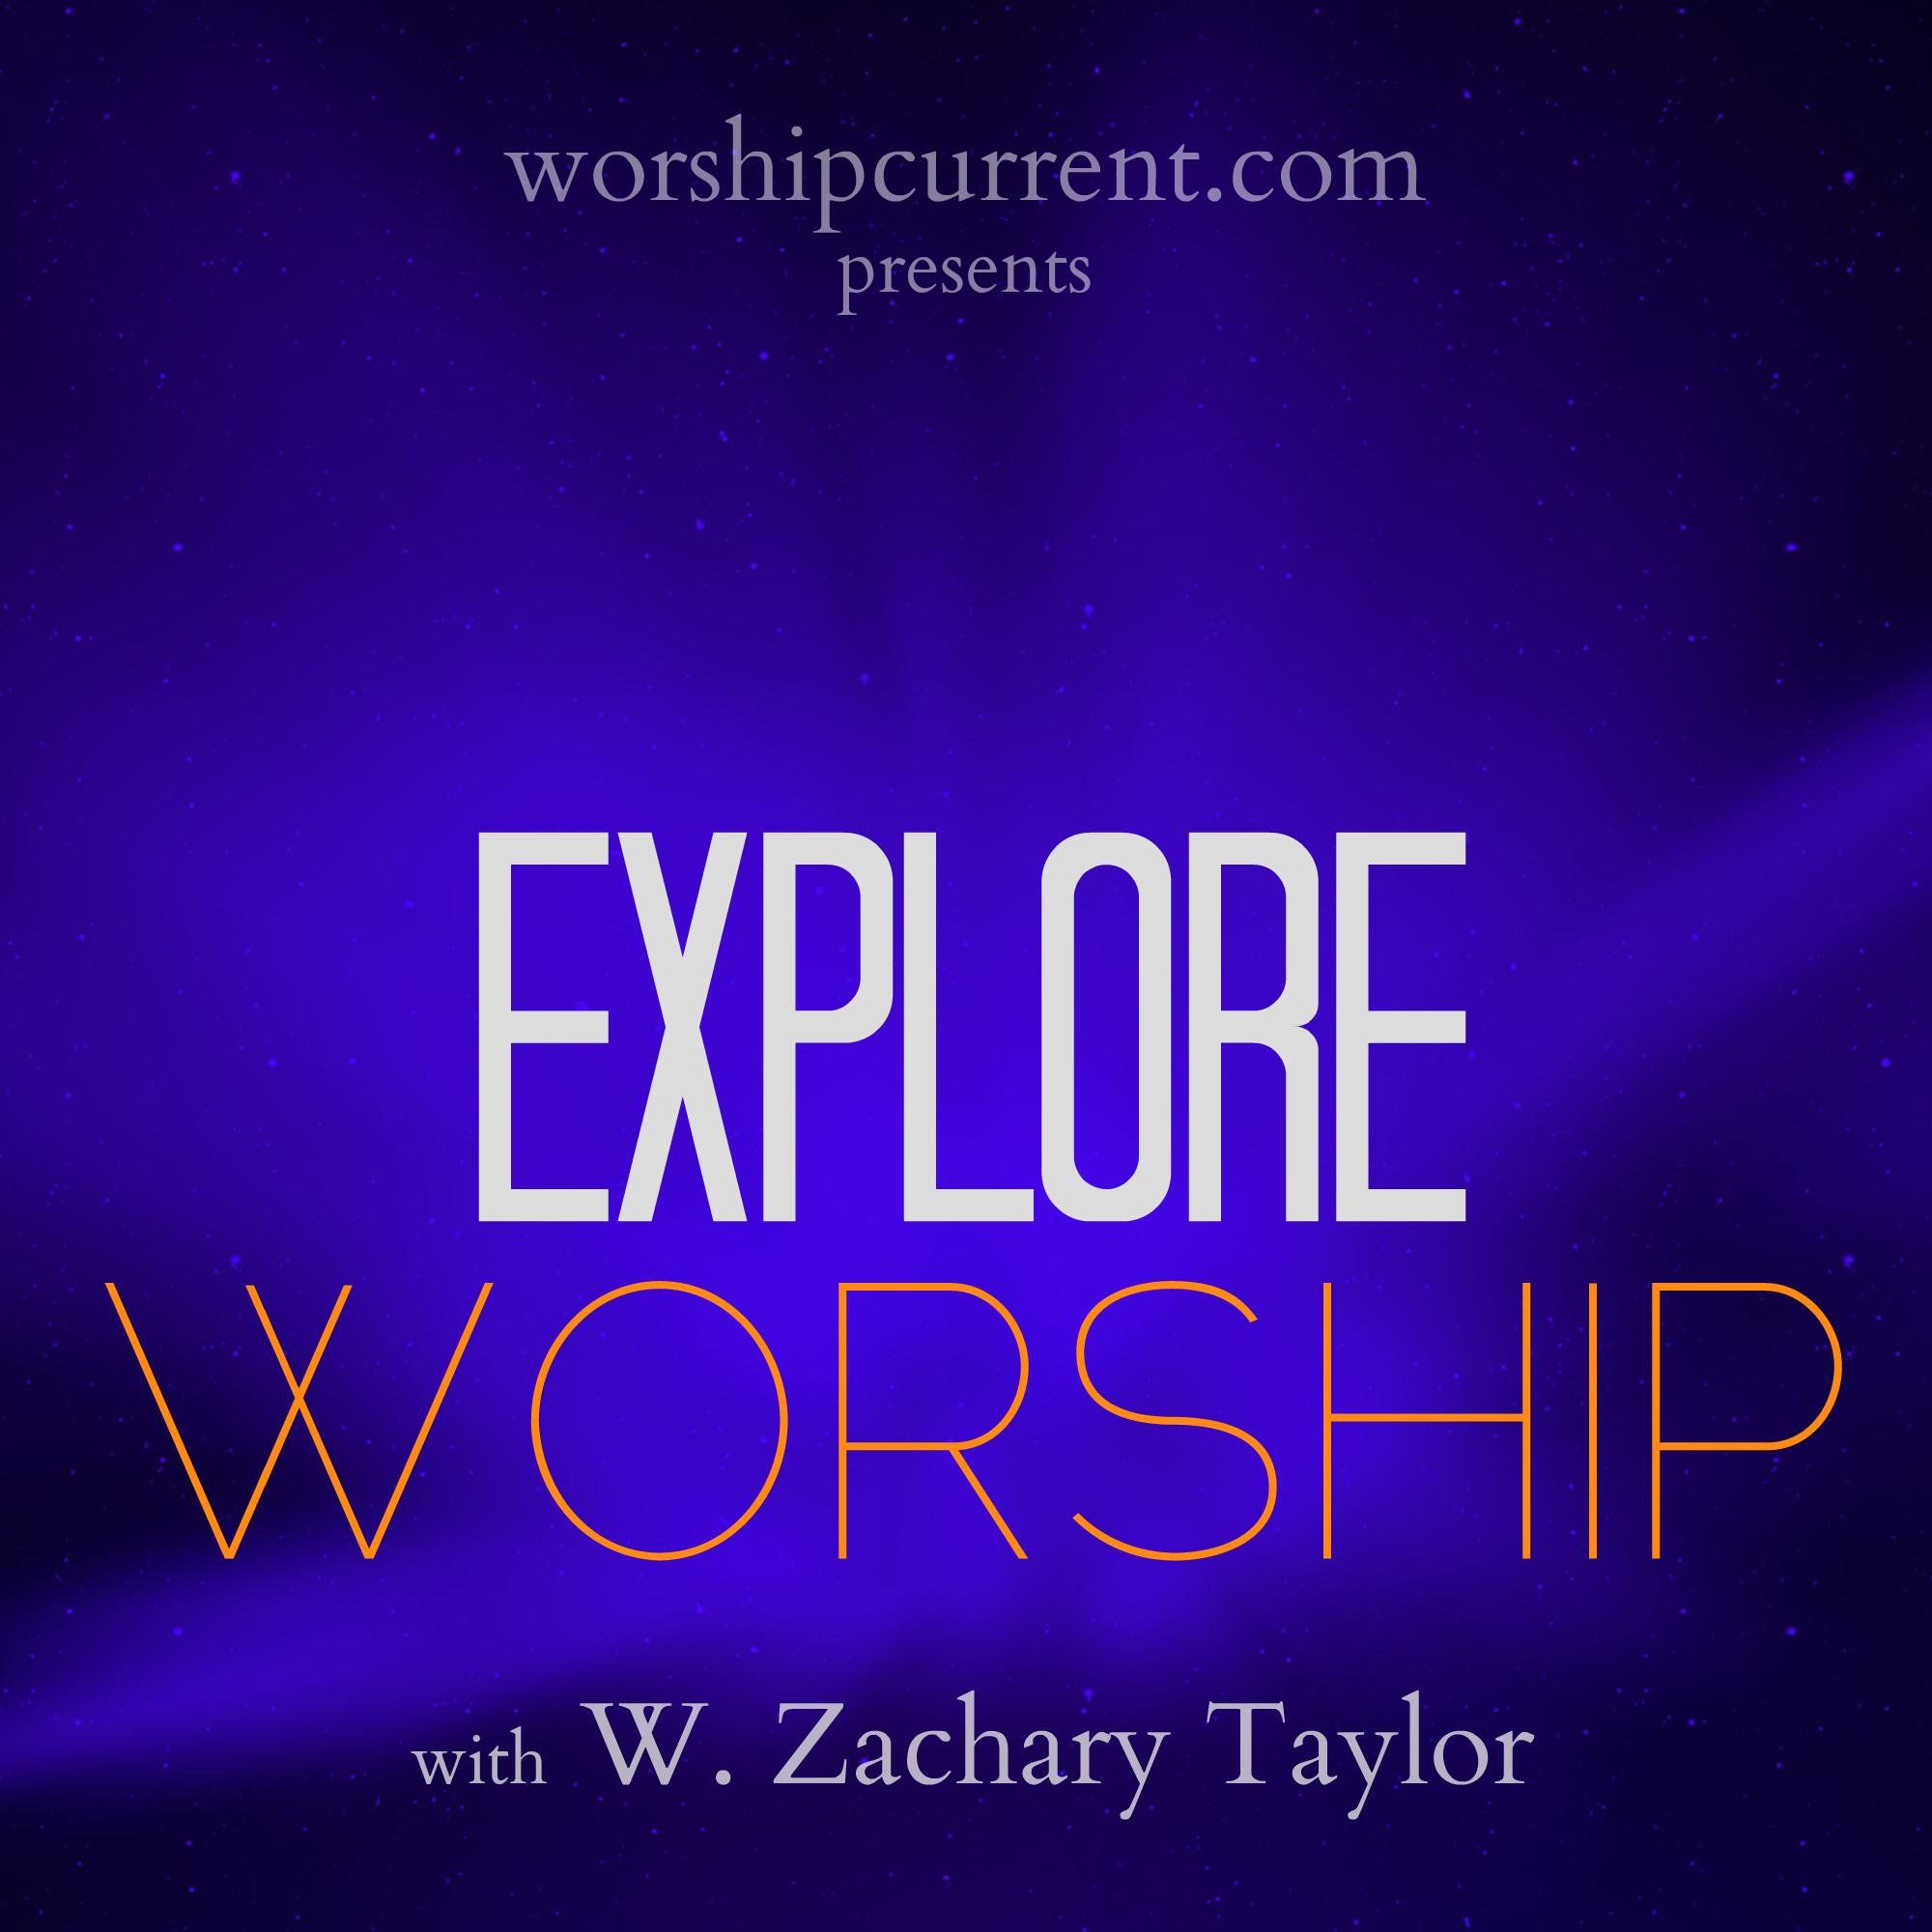 Explore Worship Podcast